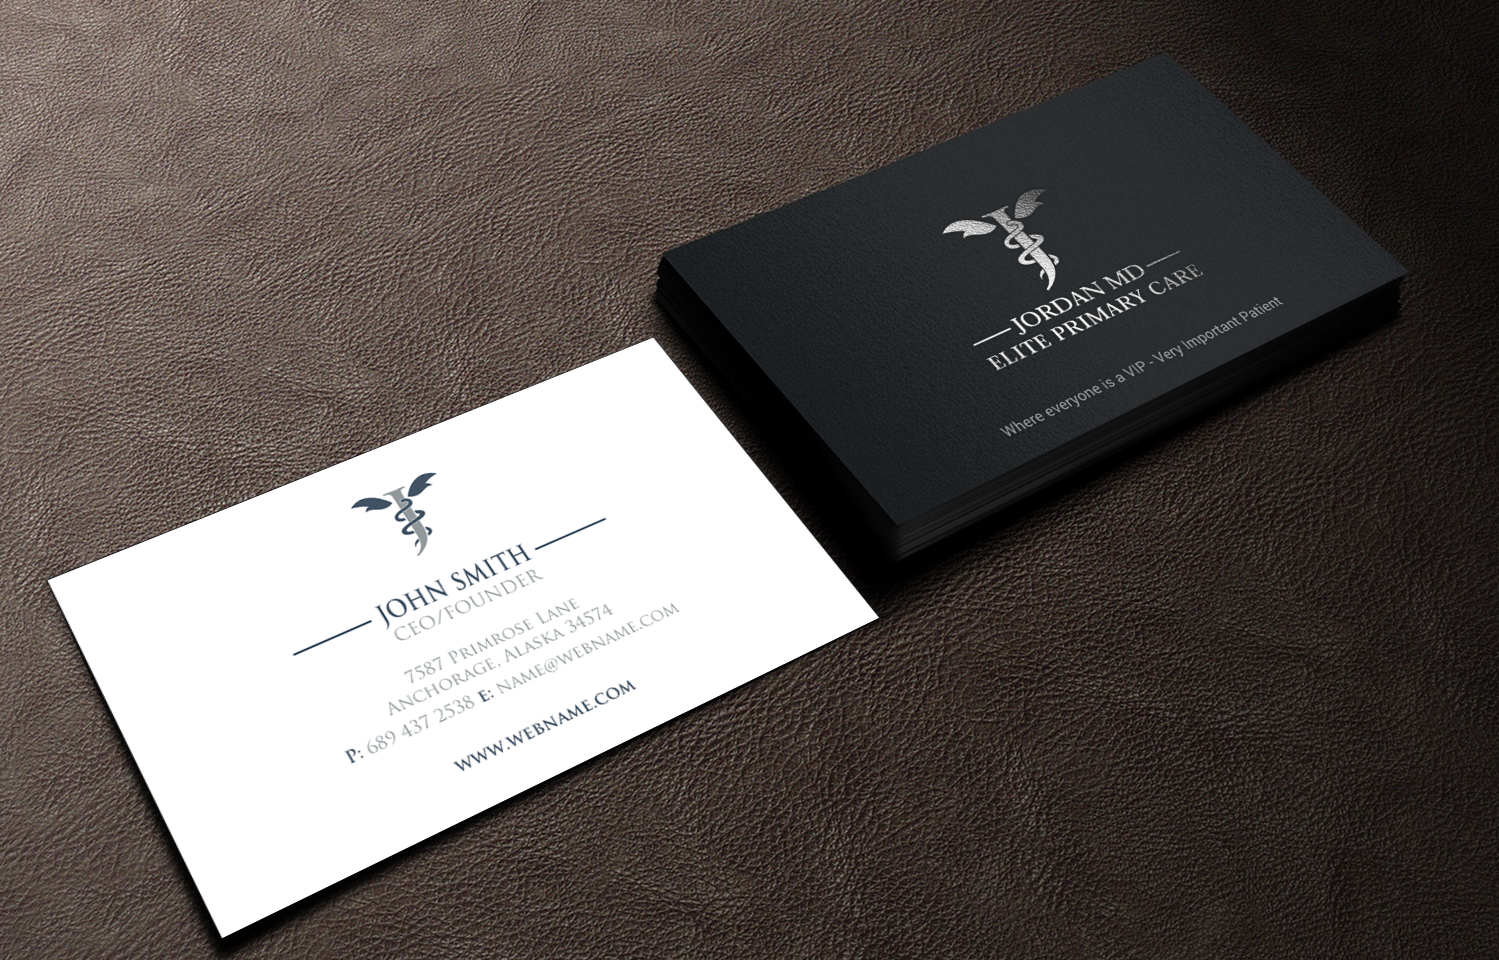 Serious professional medical business card design for jordan elite business card design by chandrayaaneative for jordan elite primary care design 17414058 colourmoves